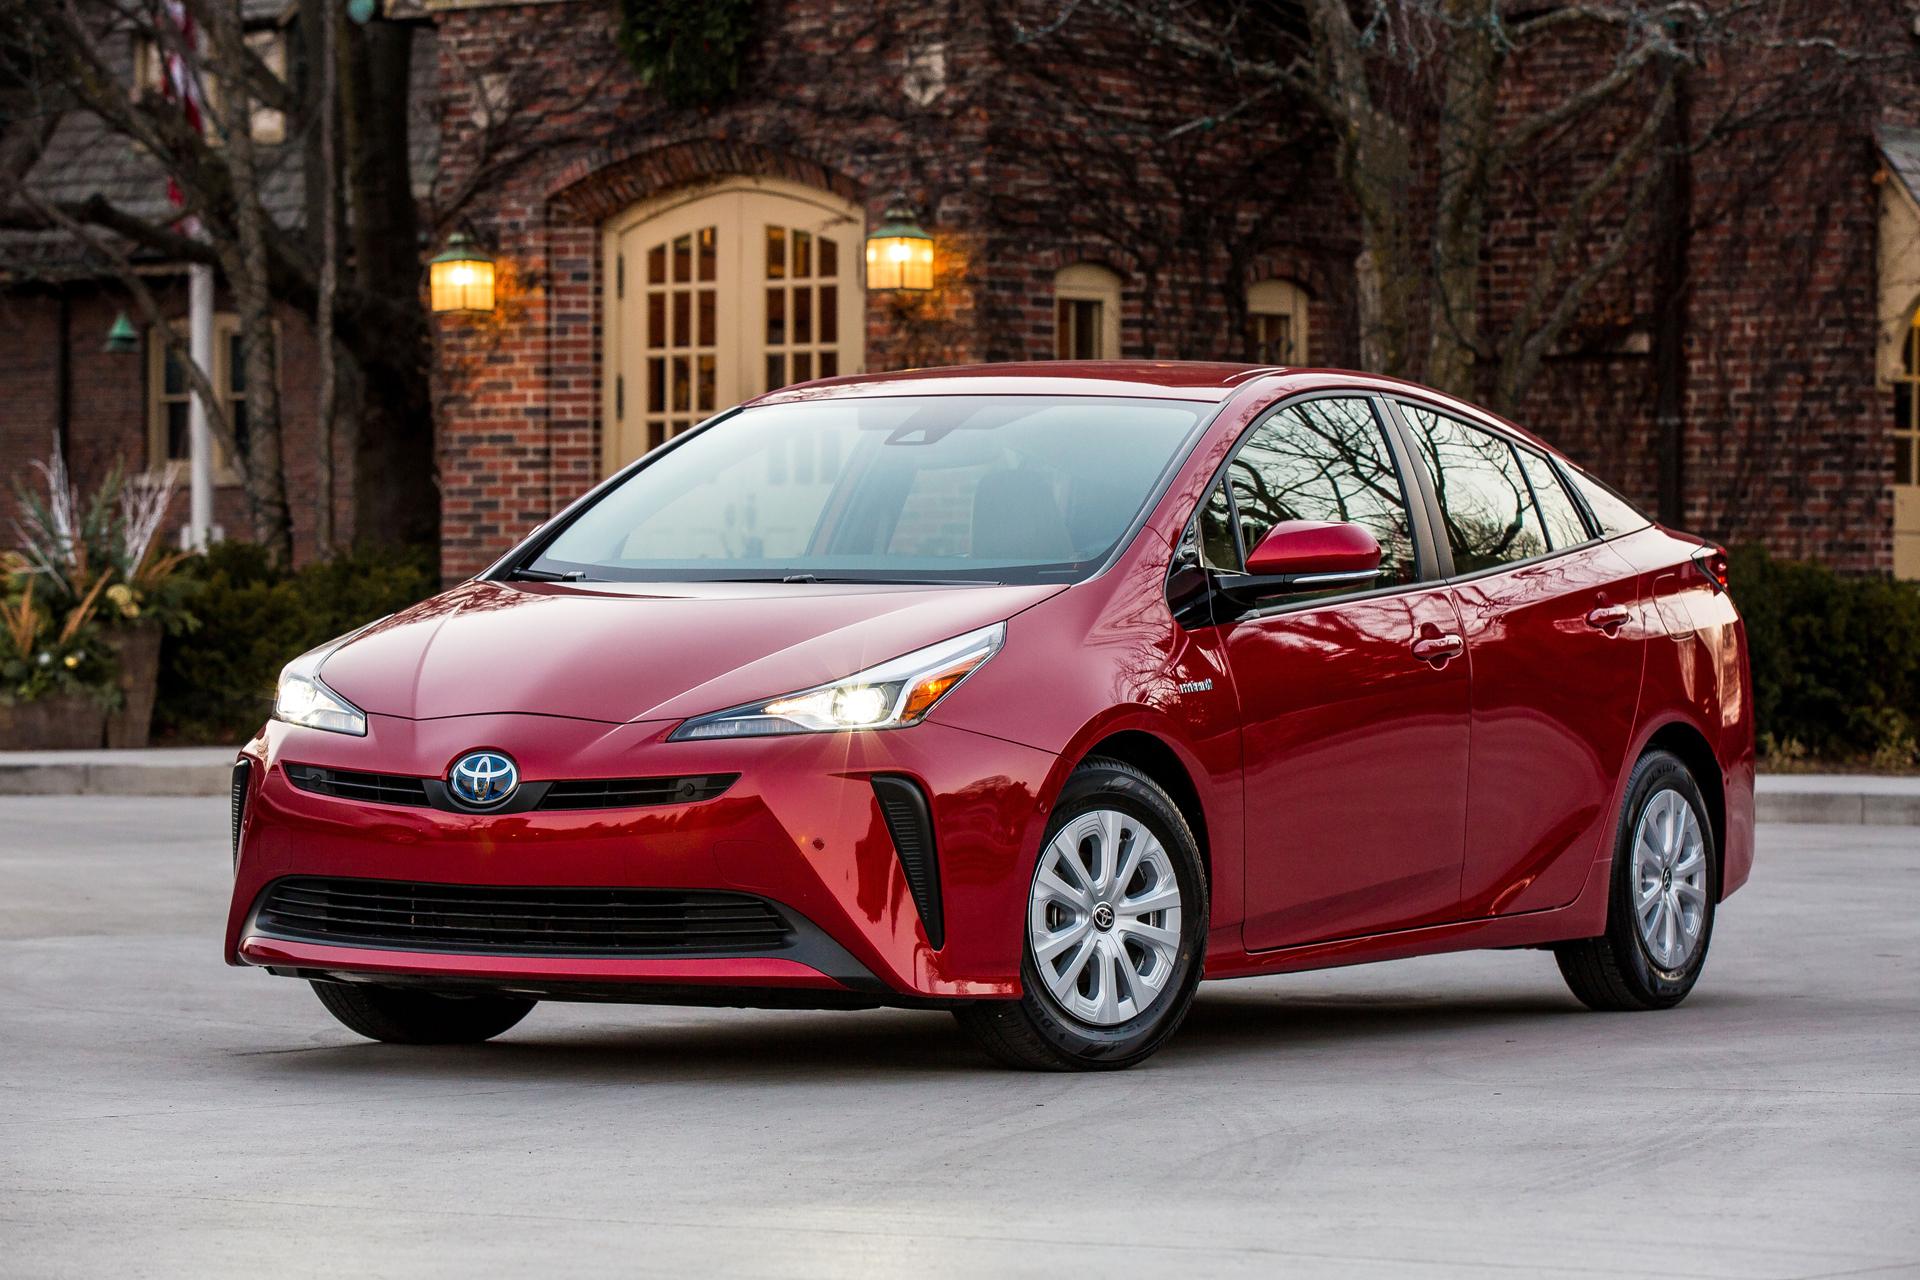 2020 Toyota Prius Release Date